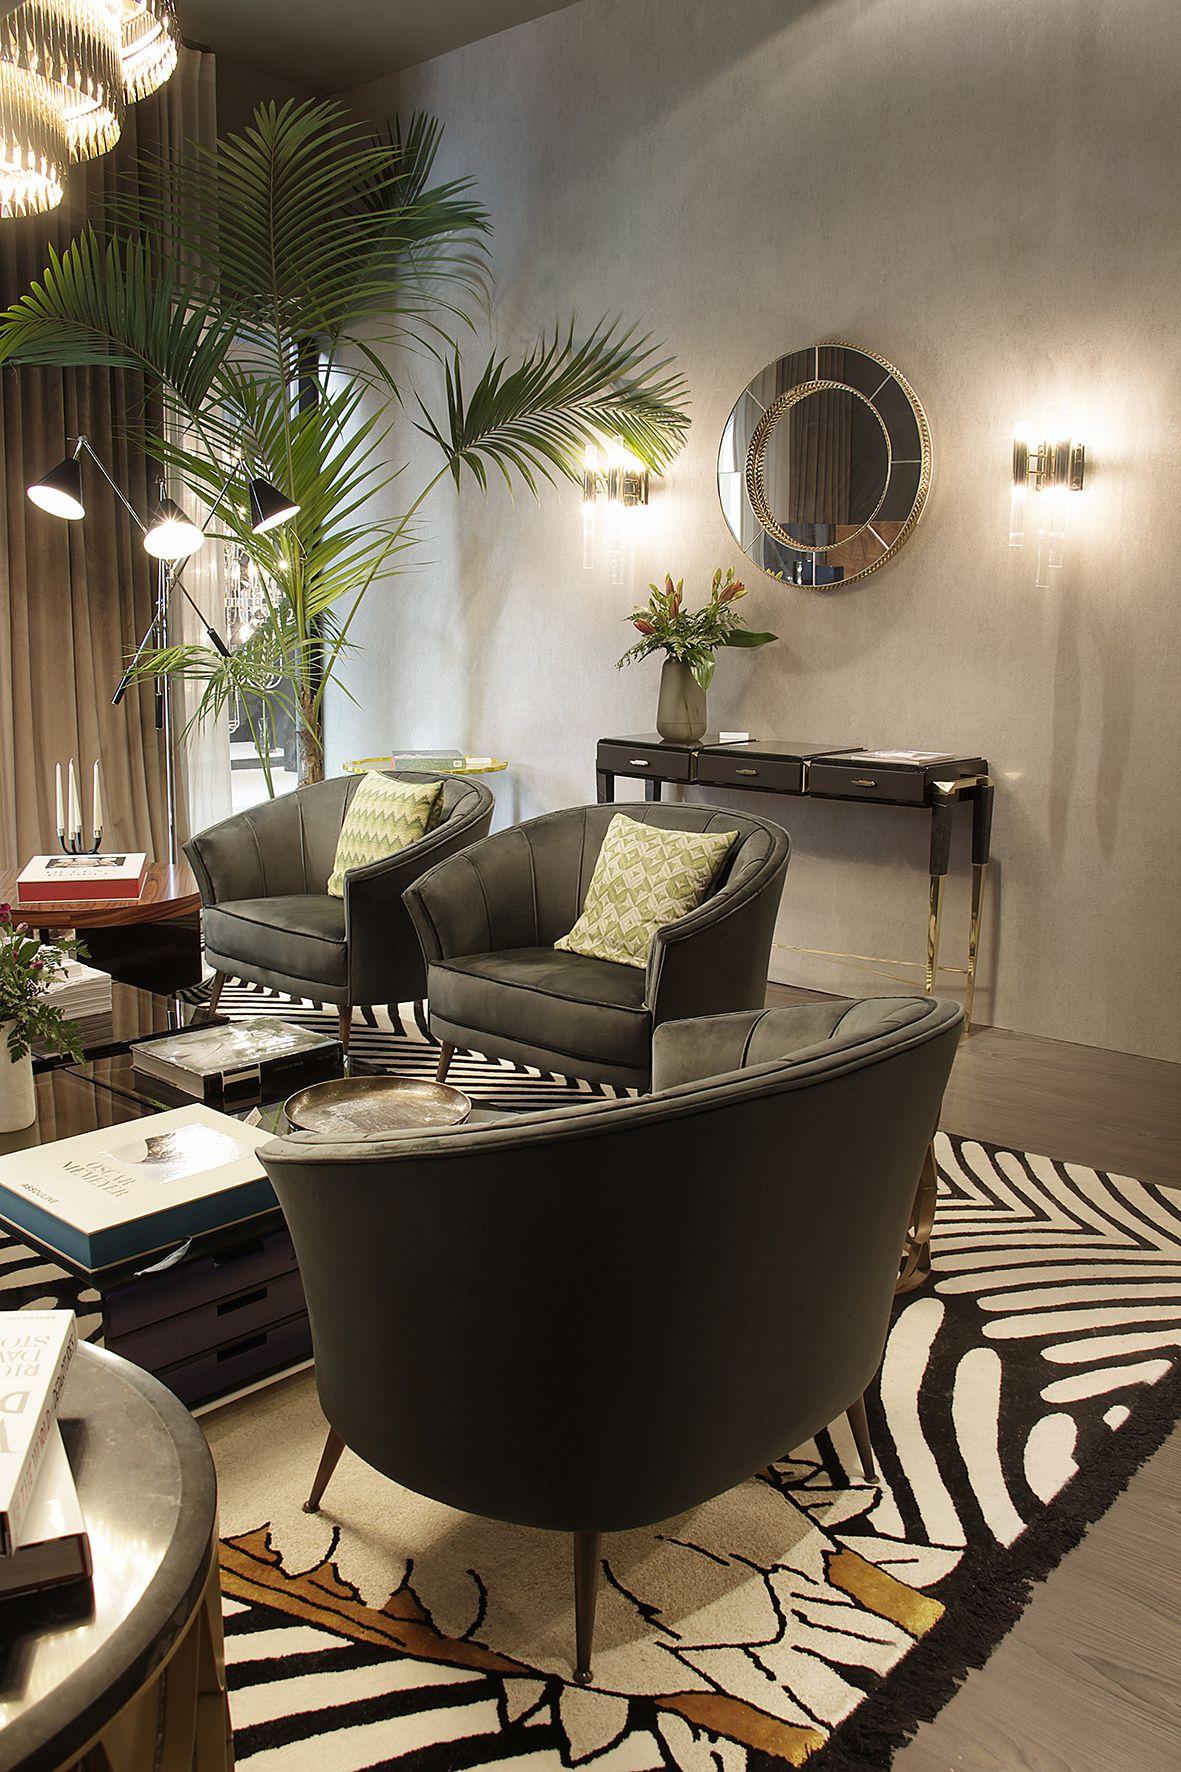 Inspiring and sophisticated chairs at maison et objet interiordesign modernchairs maisonetobjet